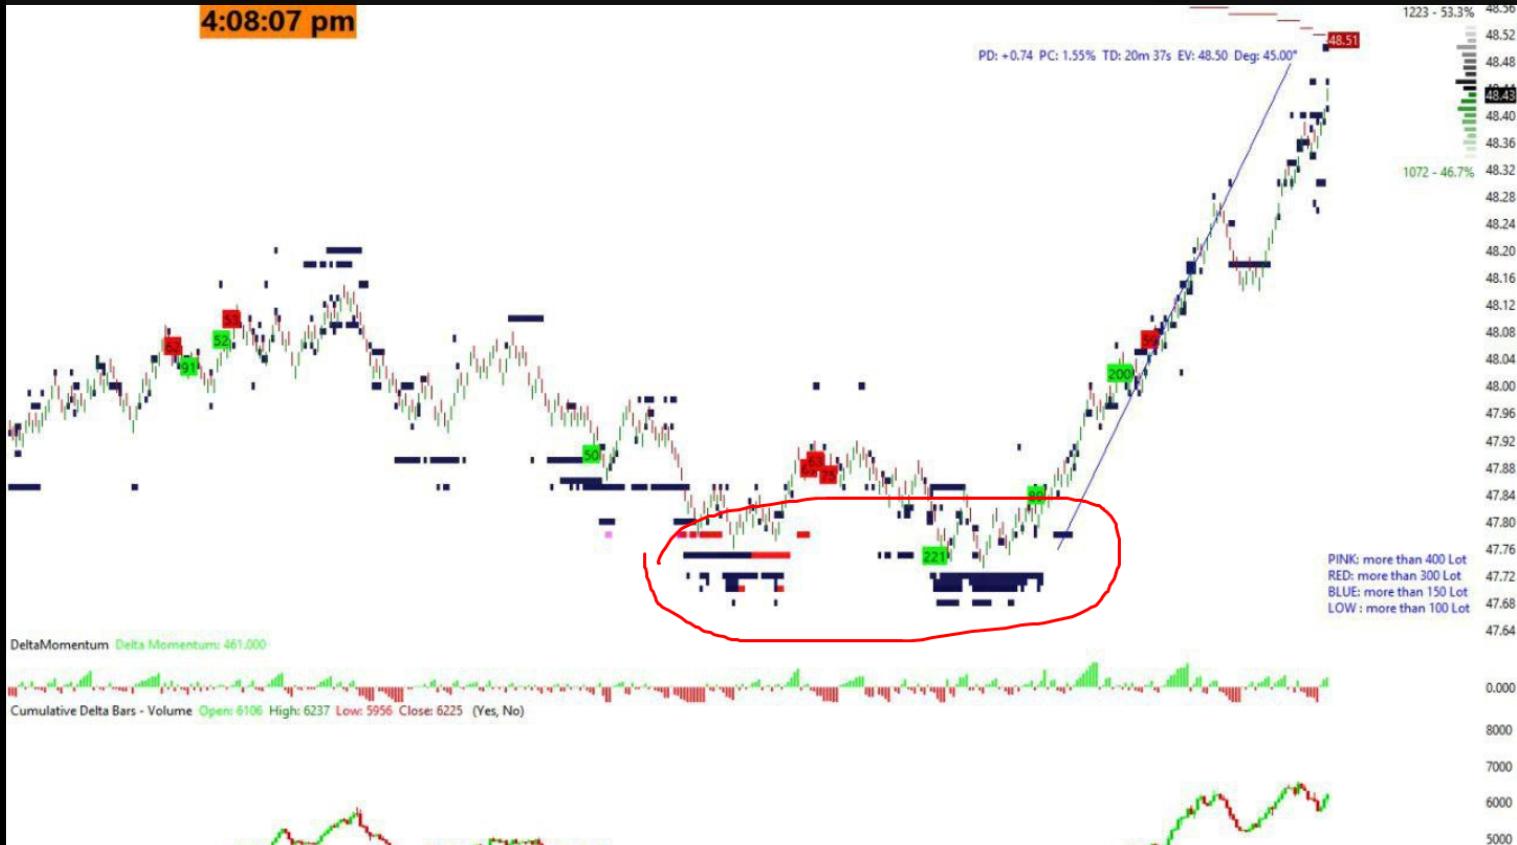 Bookmap xRay - Platforms and Indicators | futures io social day trading